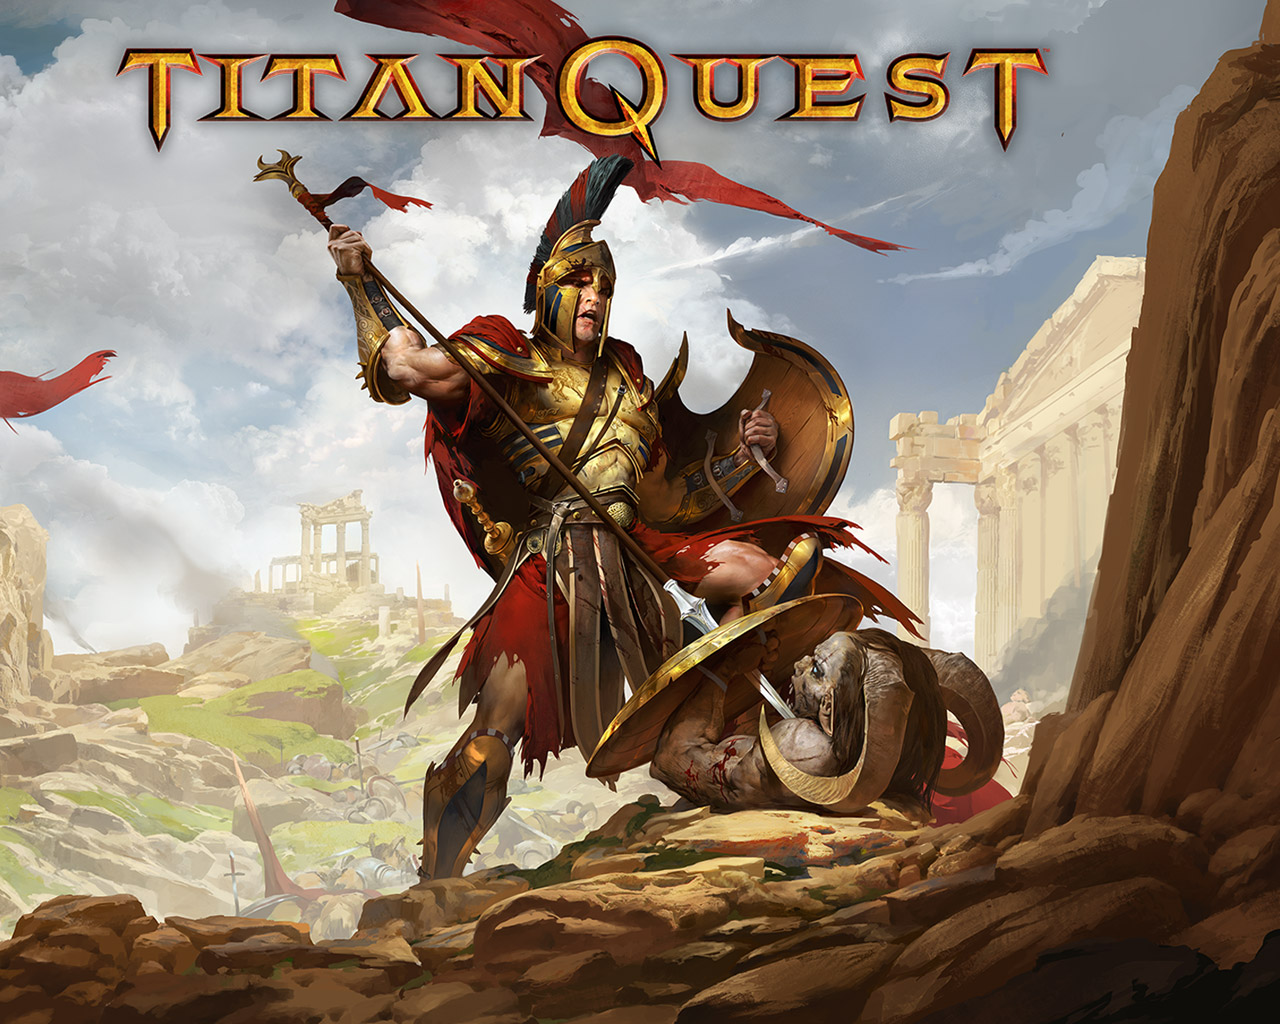 Titan Quest Wallpaper in 1280x1024